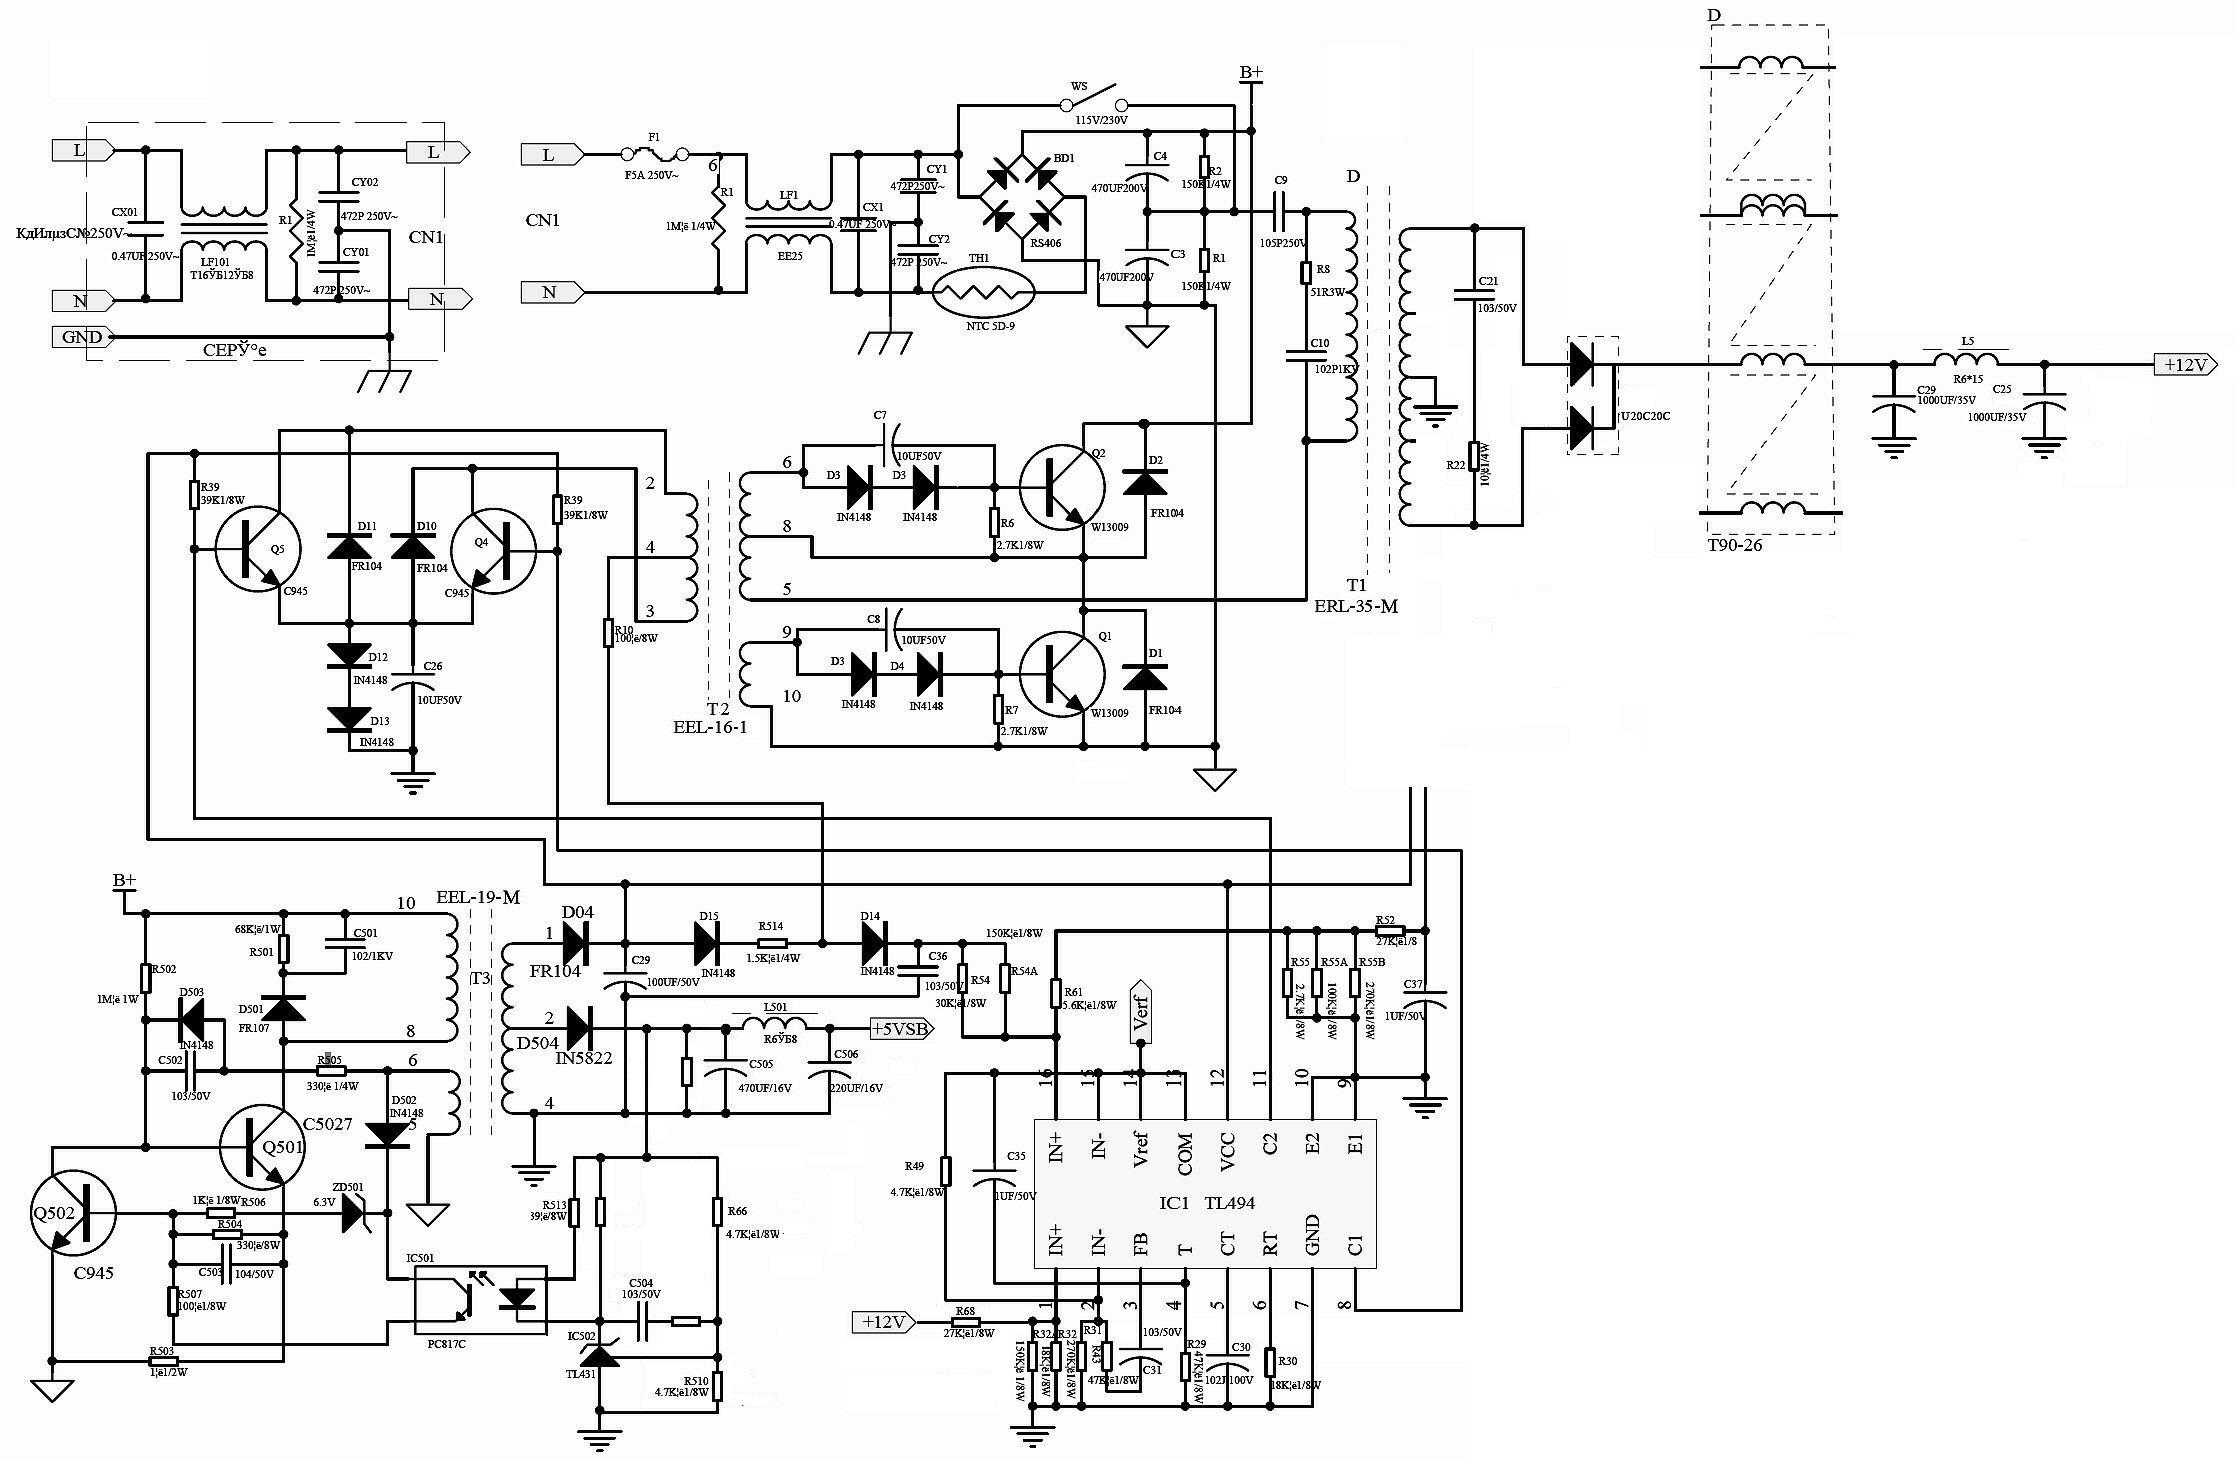 K7500c схема включения